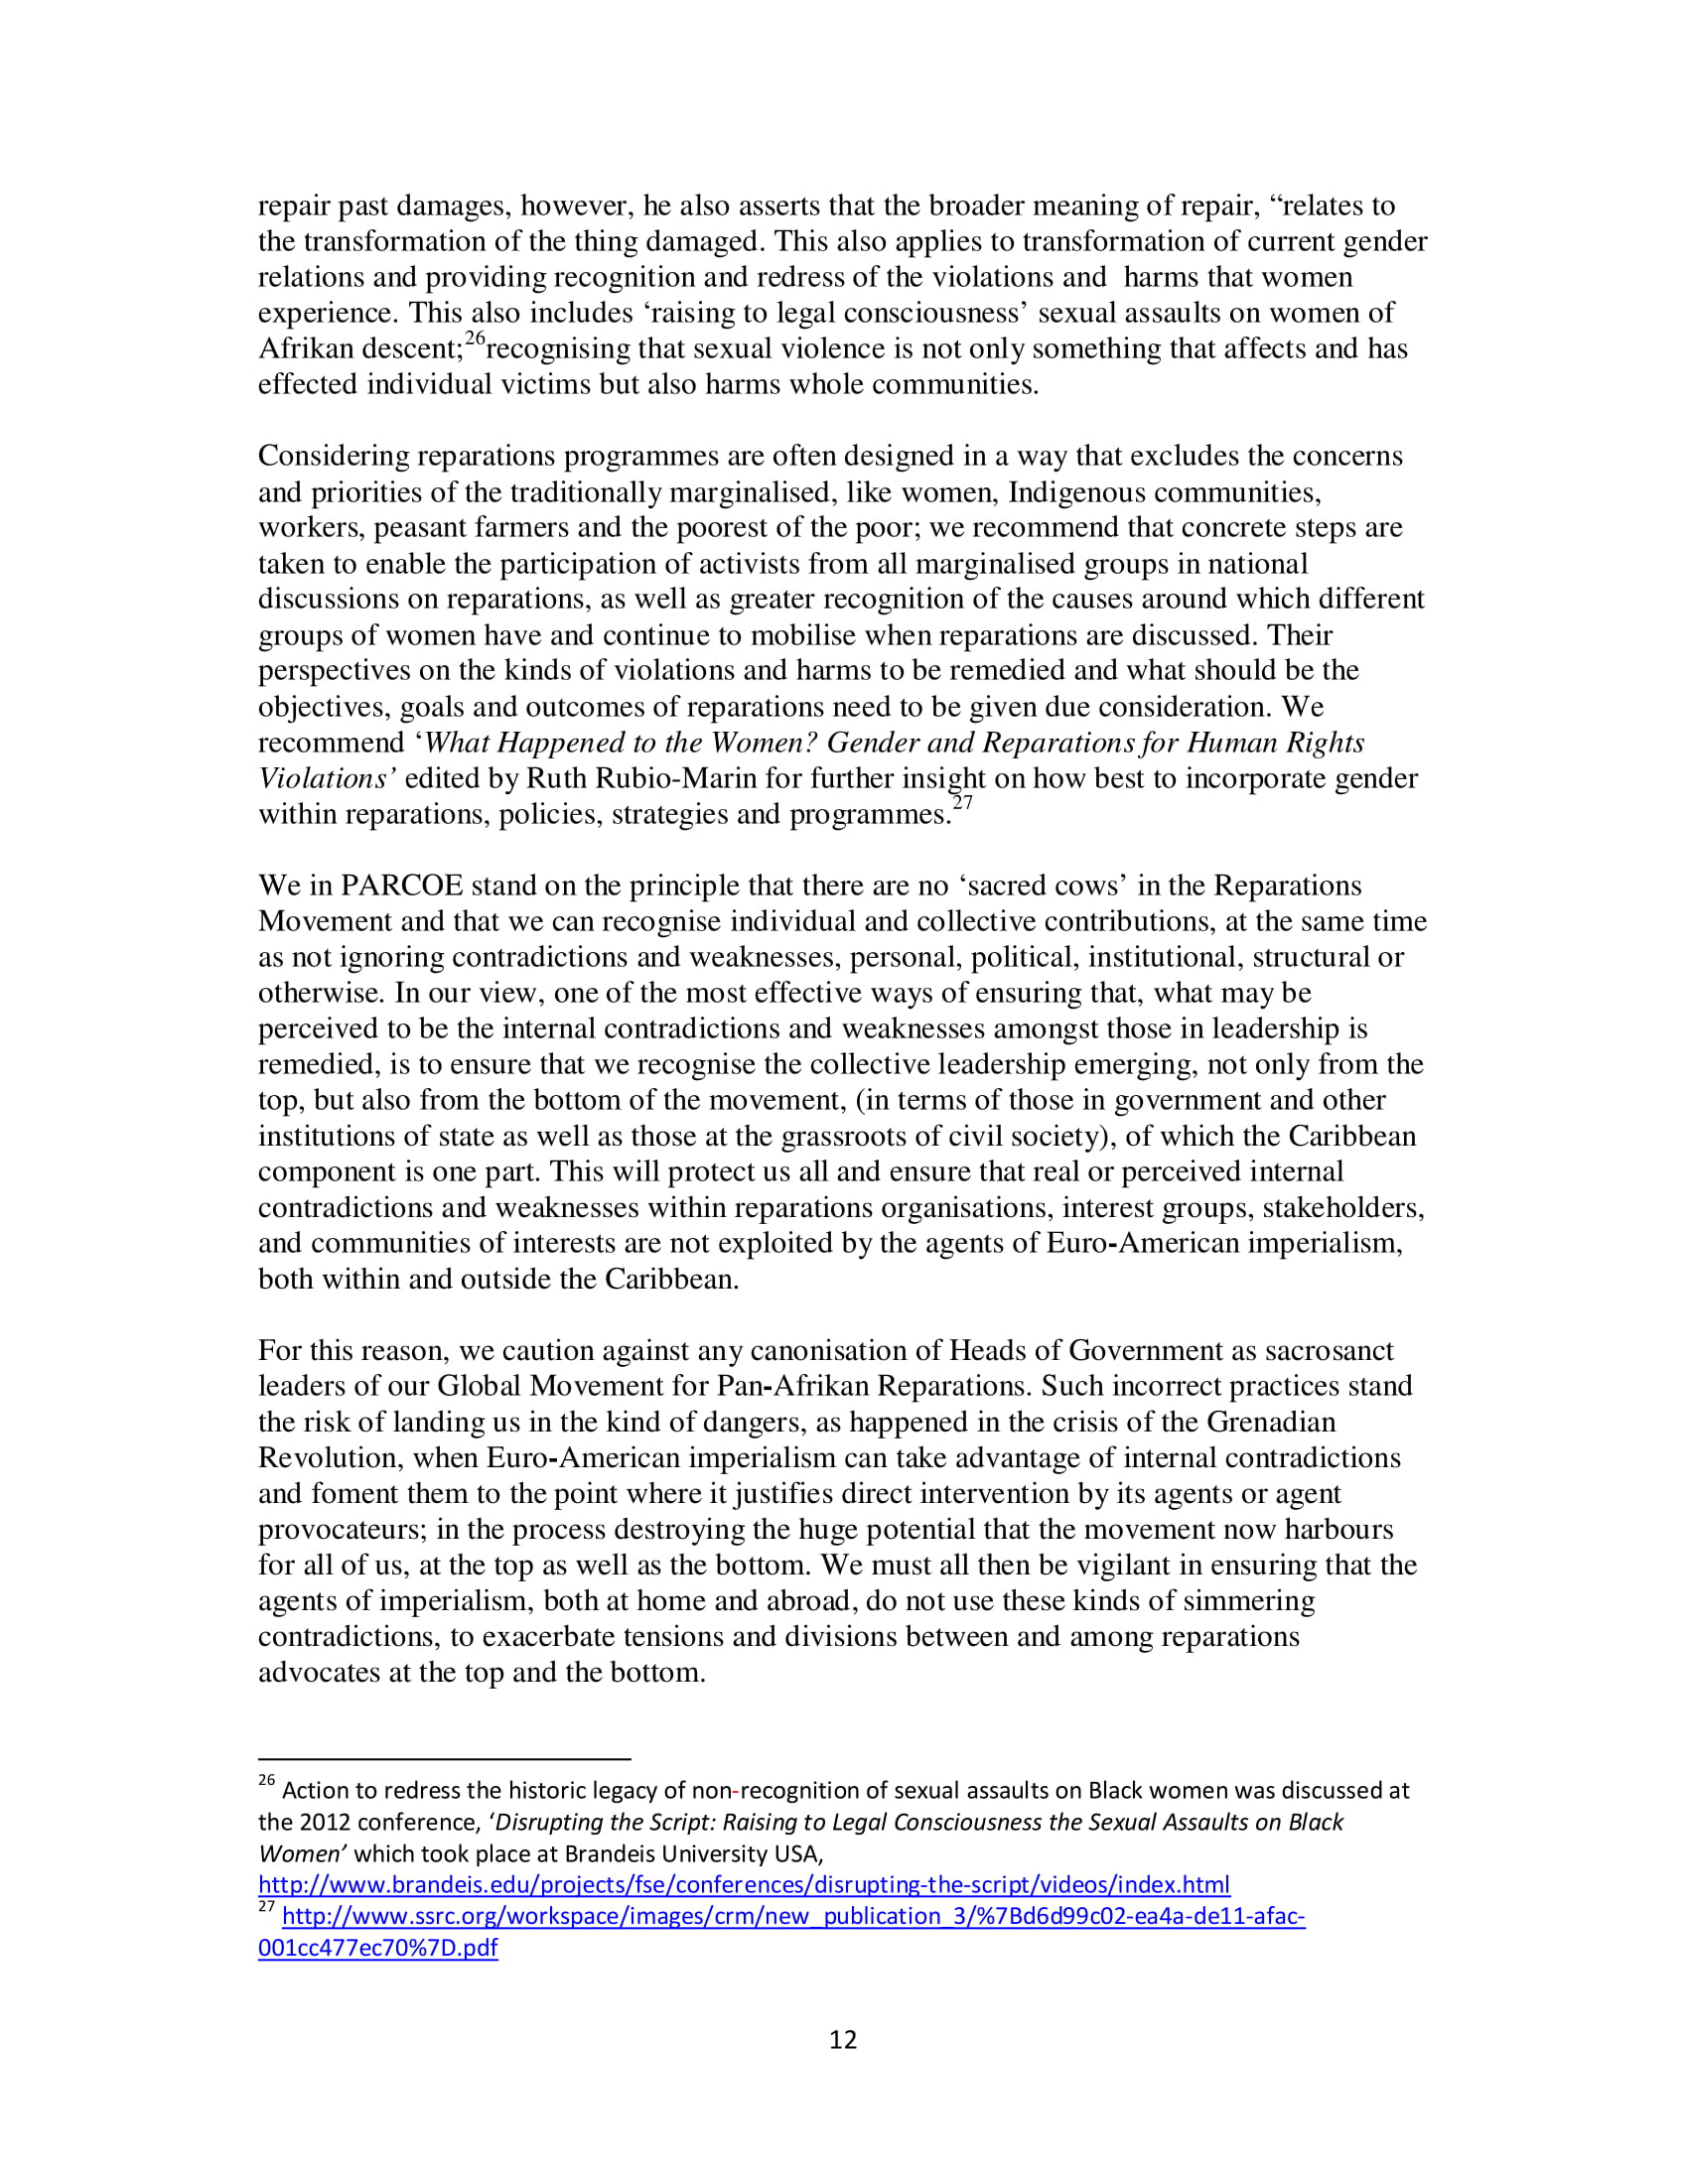 PARCOE CARICOM REPARATIONS POSITION PAPER-12